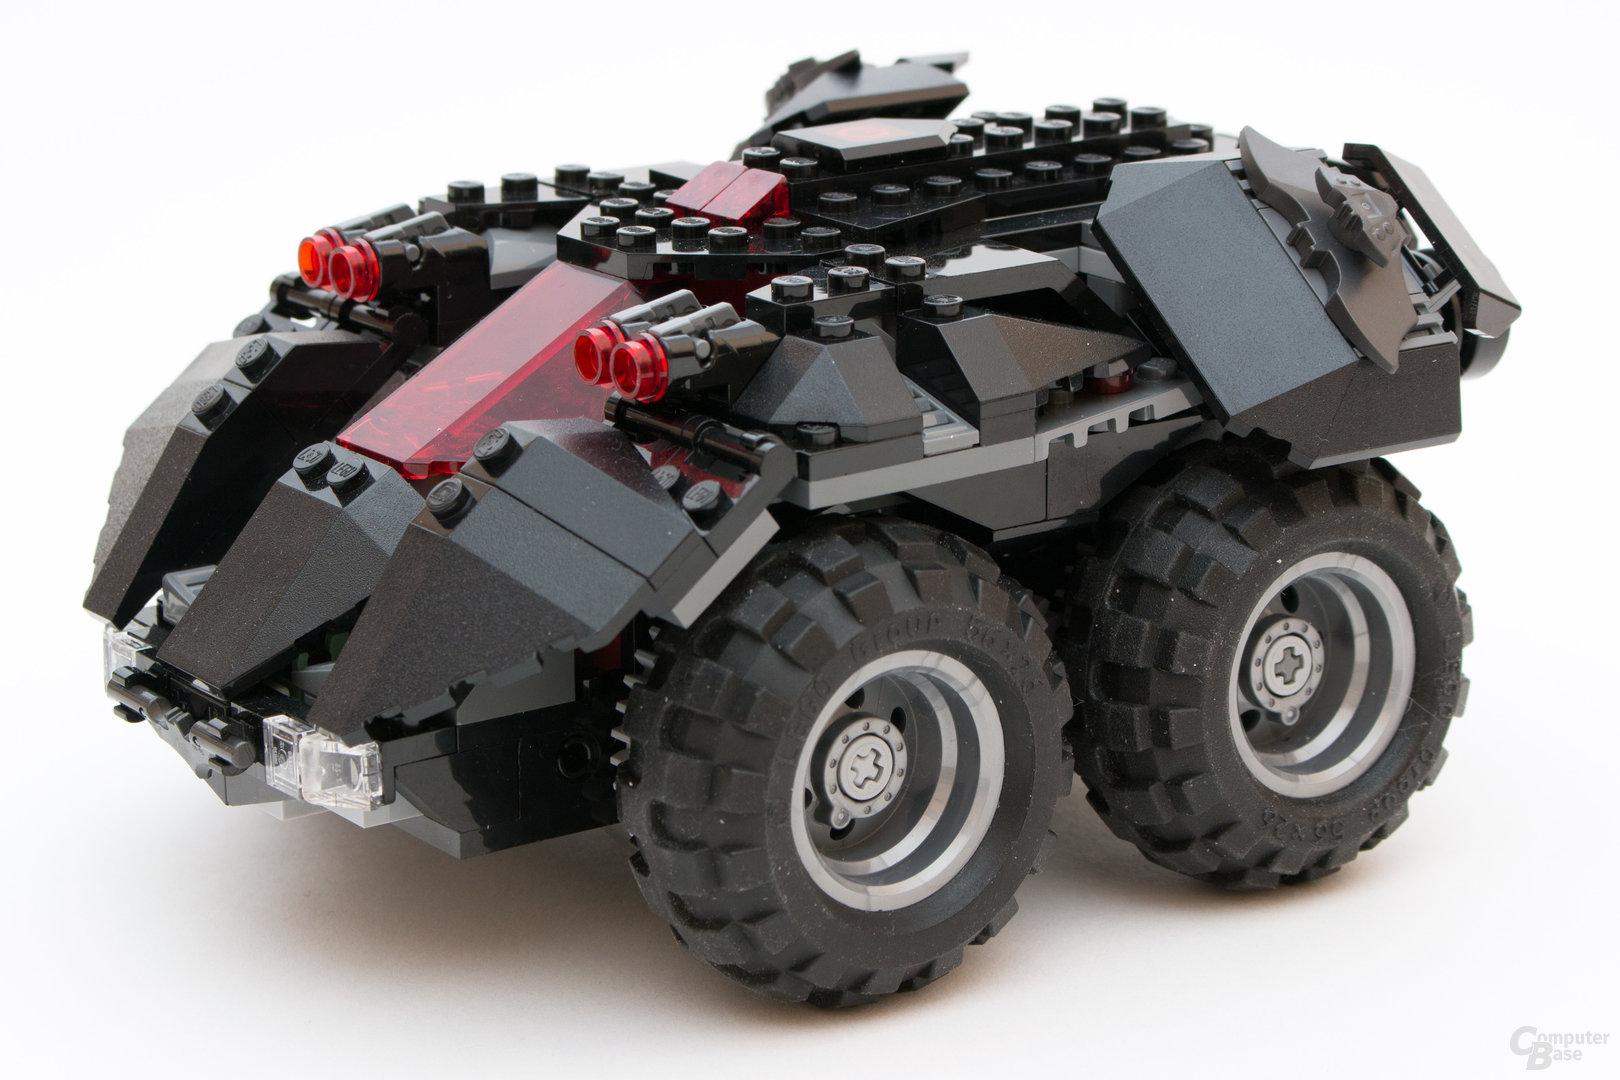 Das ferngesteuerte Batmobile 76112 von Lego